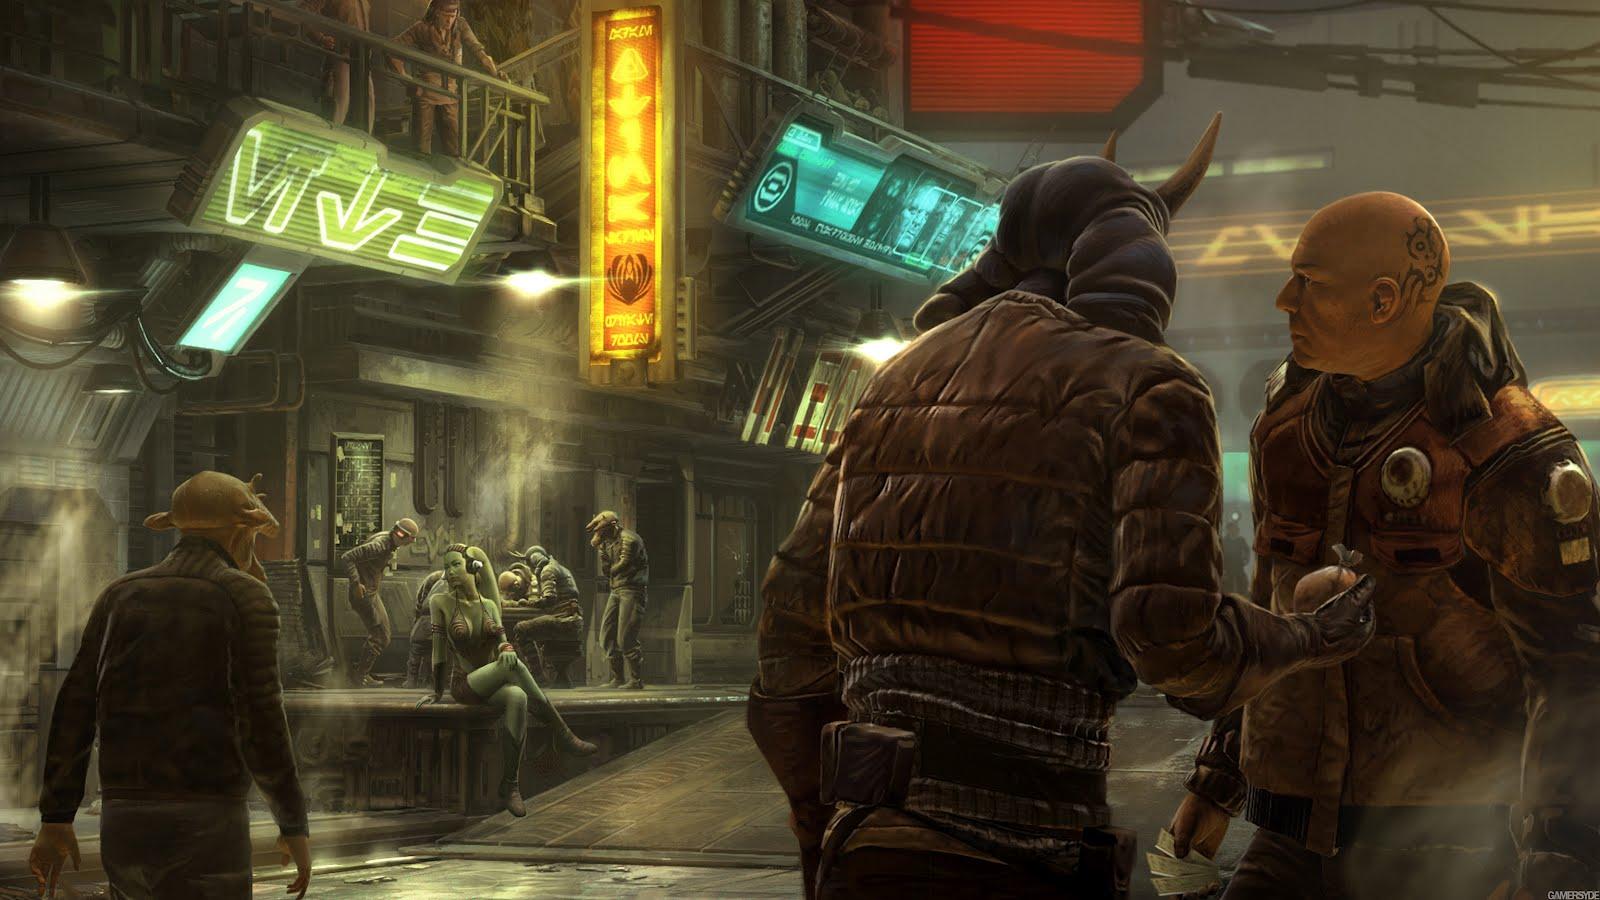 Disney pulls plug on Blade Runner-ish Star Wars 1313 game | SYFY WIRE